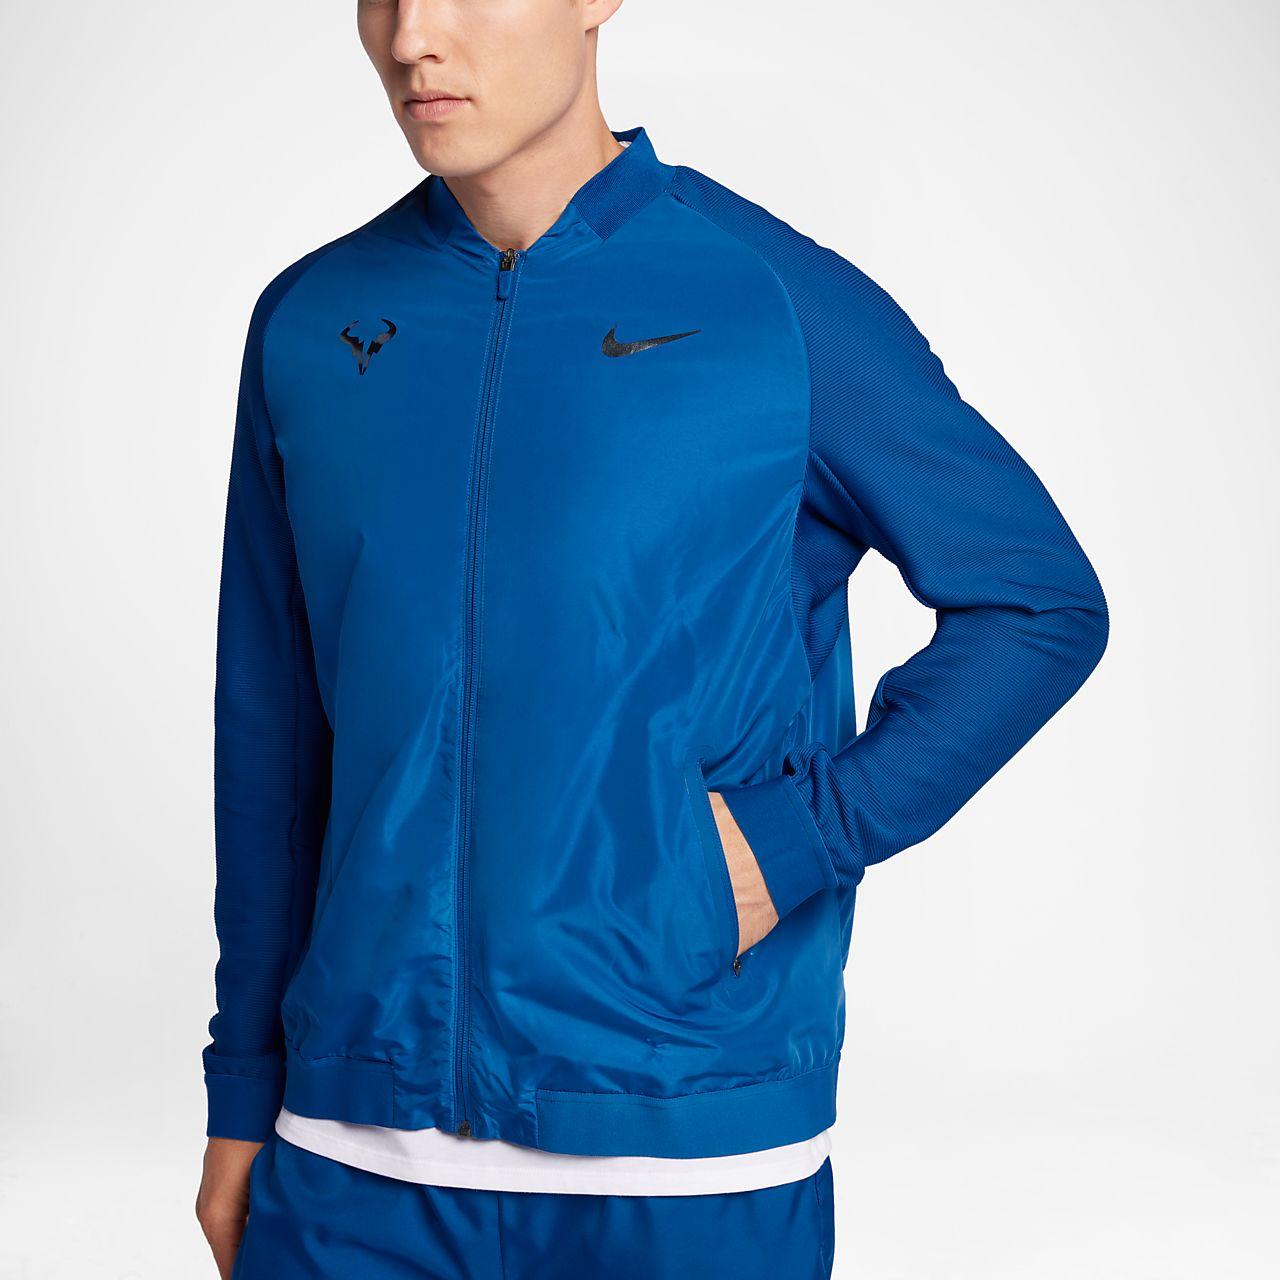 NikeCourt Rafa Men's Tennis Jacket